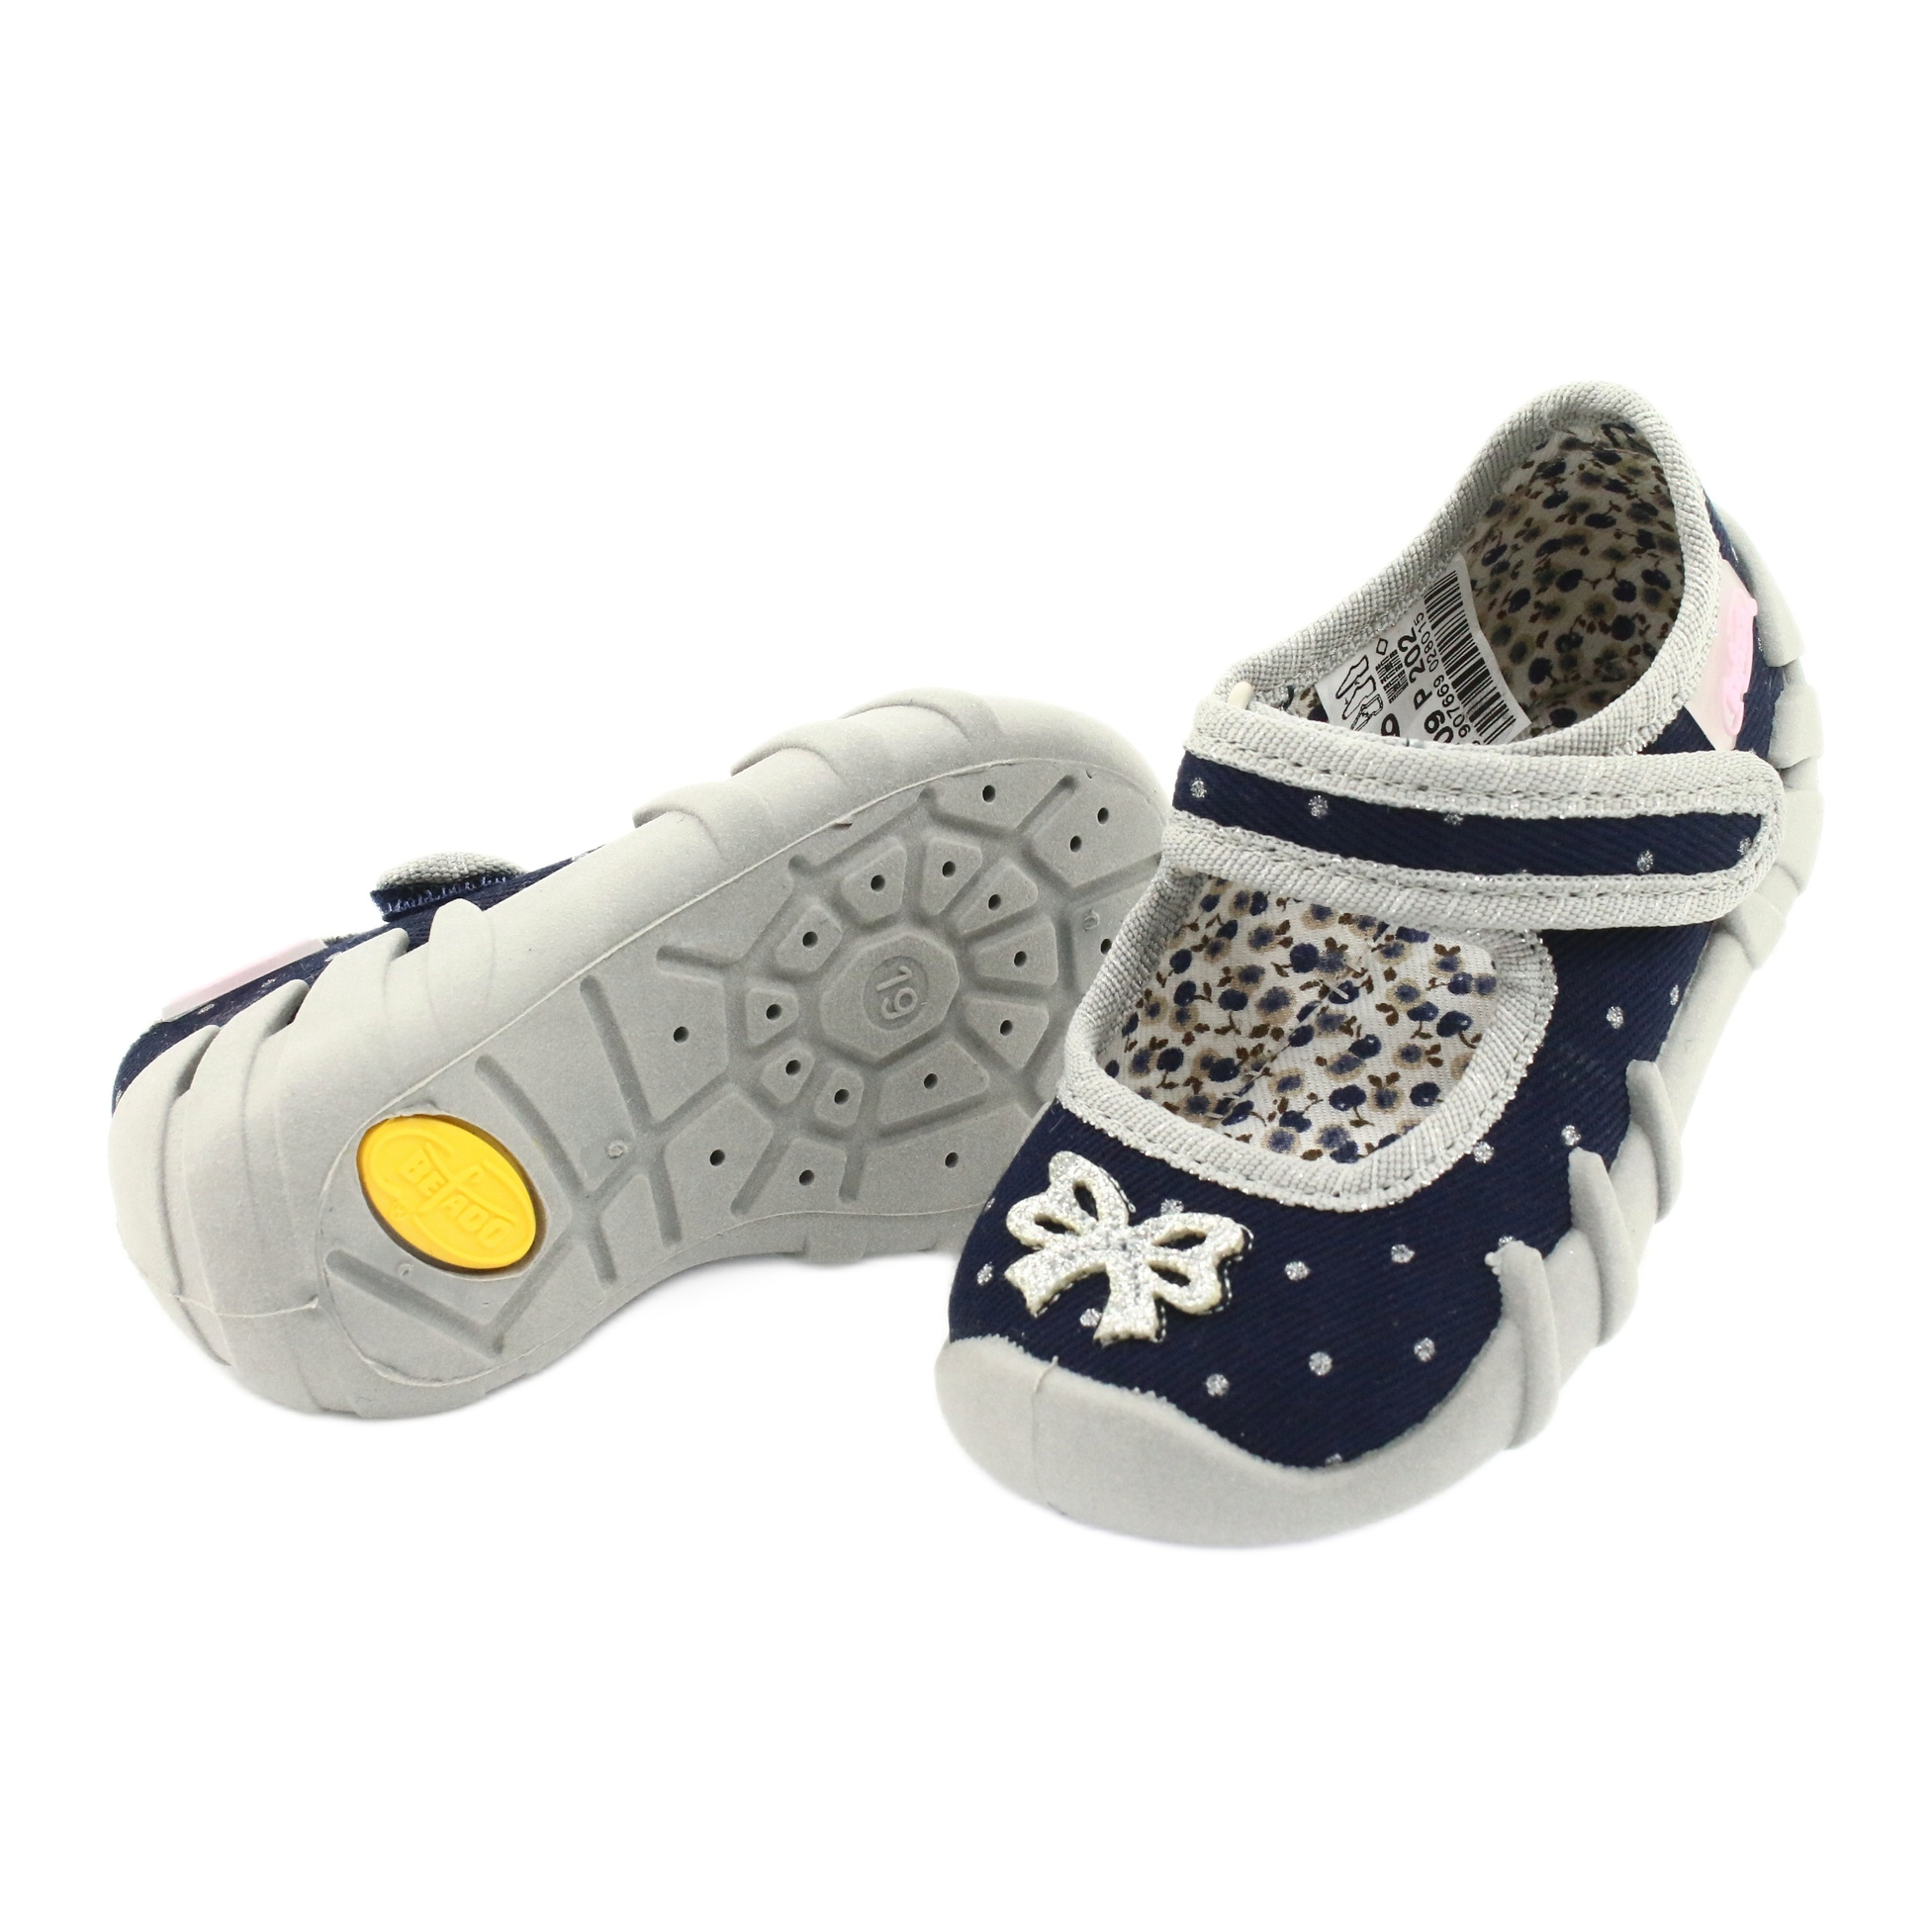 miniatura 4 - Scarpe per bambini Befado 109P202 marina argento grigio